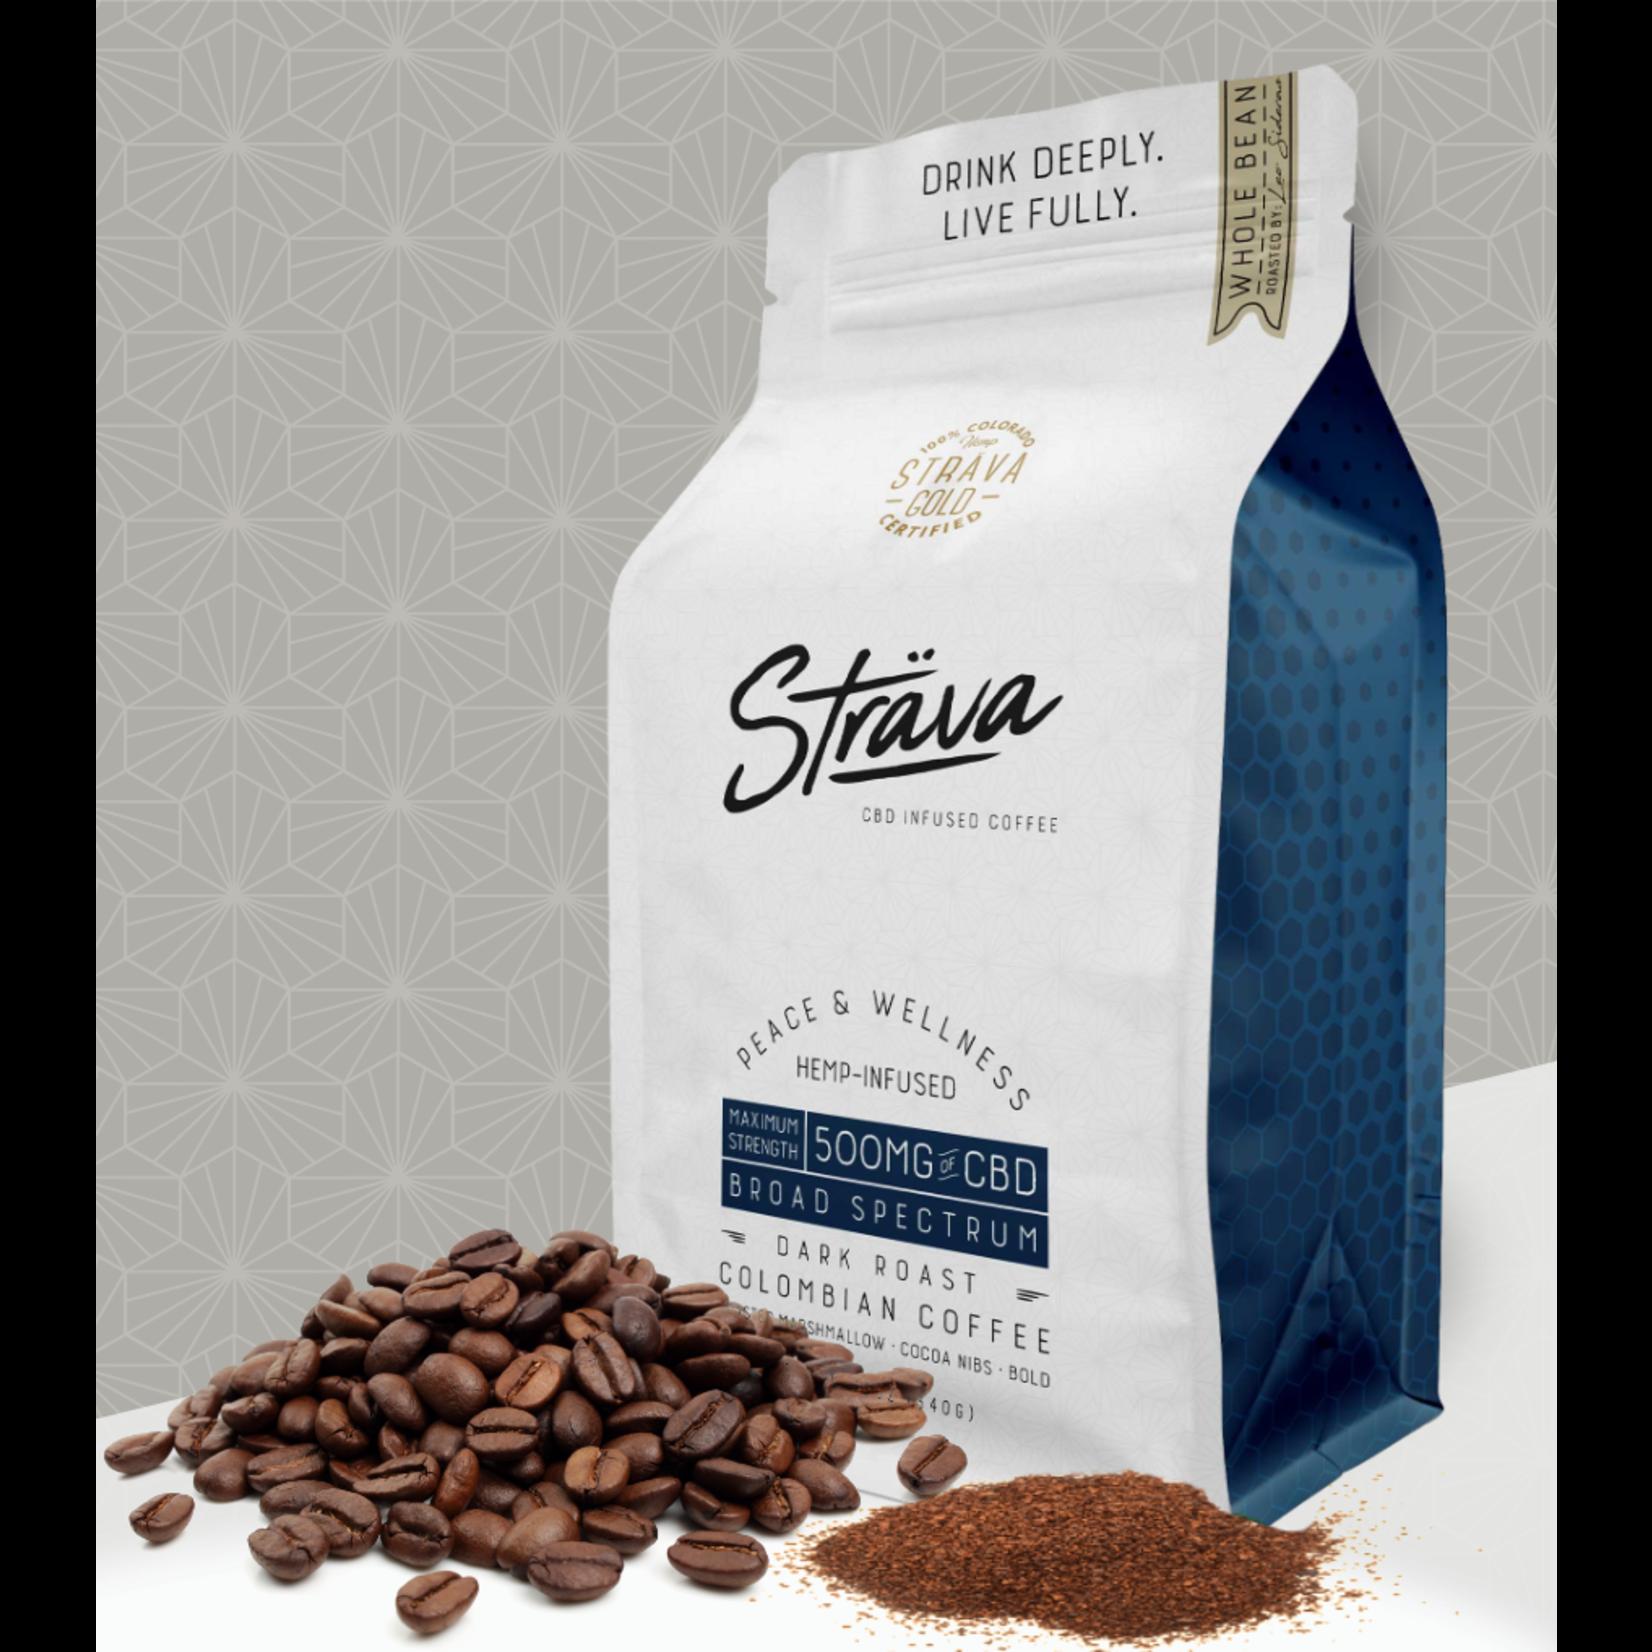 Strava Strava CBD Infused Coffee 500mg Broad Spectrum dark Roast Single Serve Keurig cup maximum Strength Columbian coffee